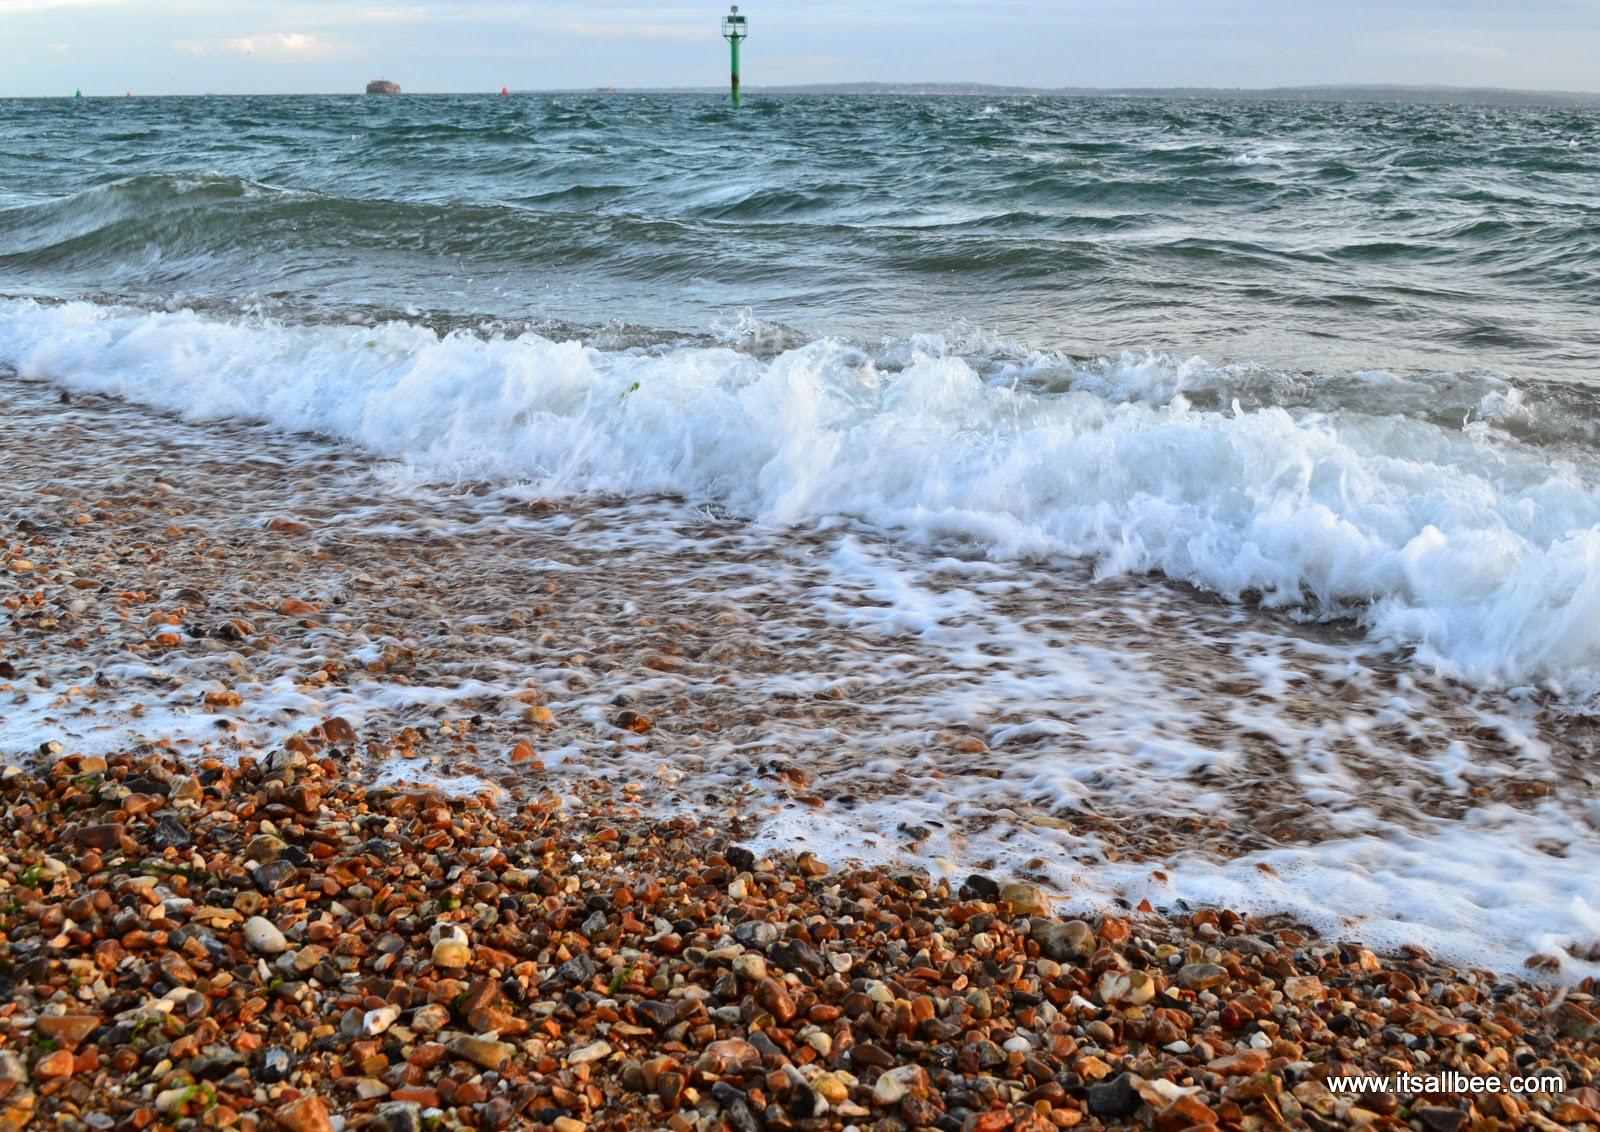 Southsea beach - Portsea Island - Portsmouth